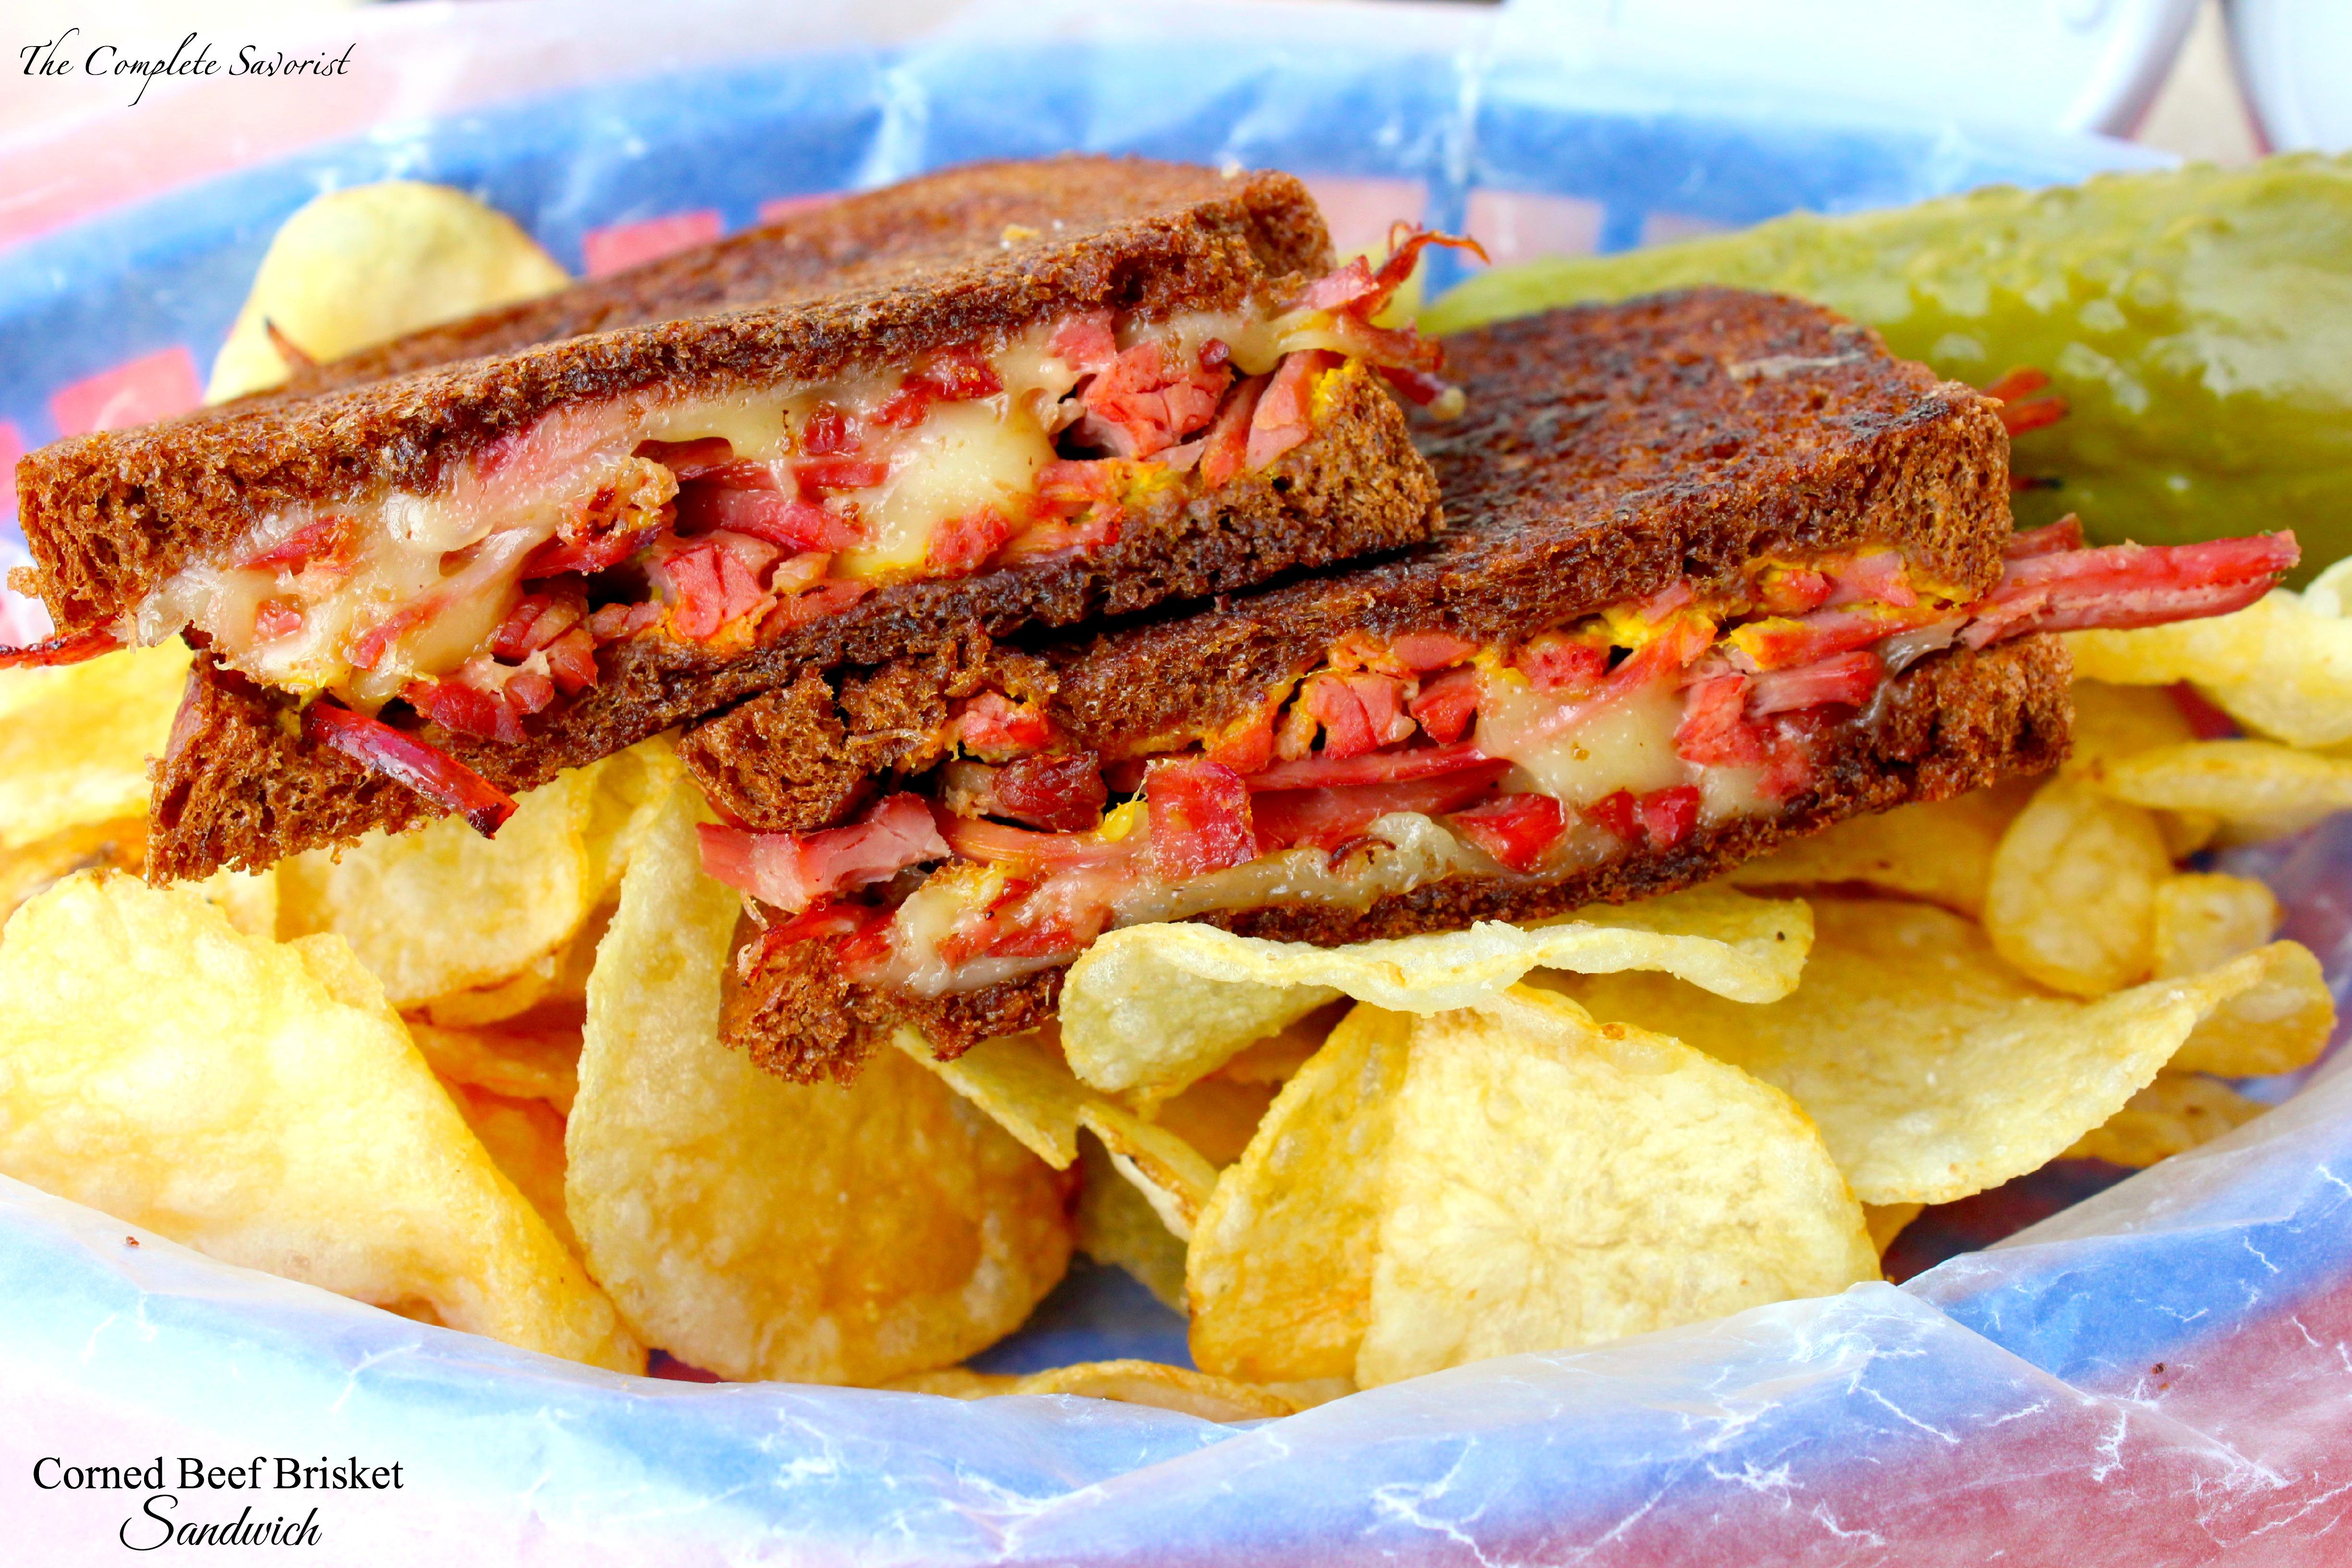 Corned Beef Brisket Sandwich ~ The Complete Savorist